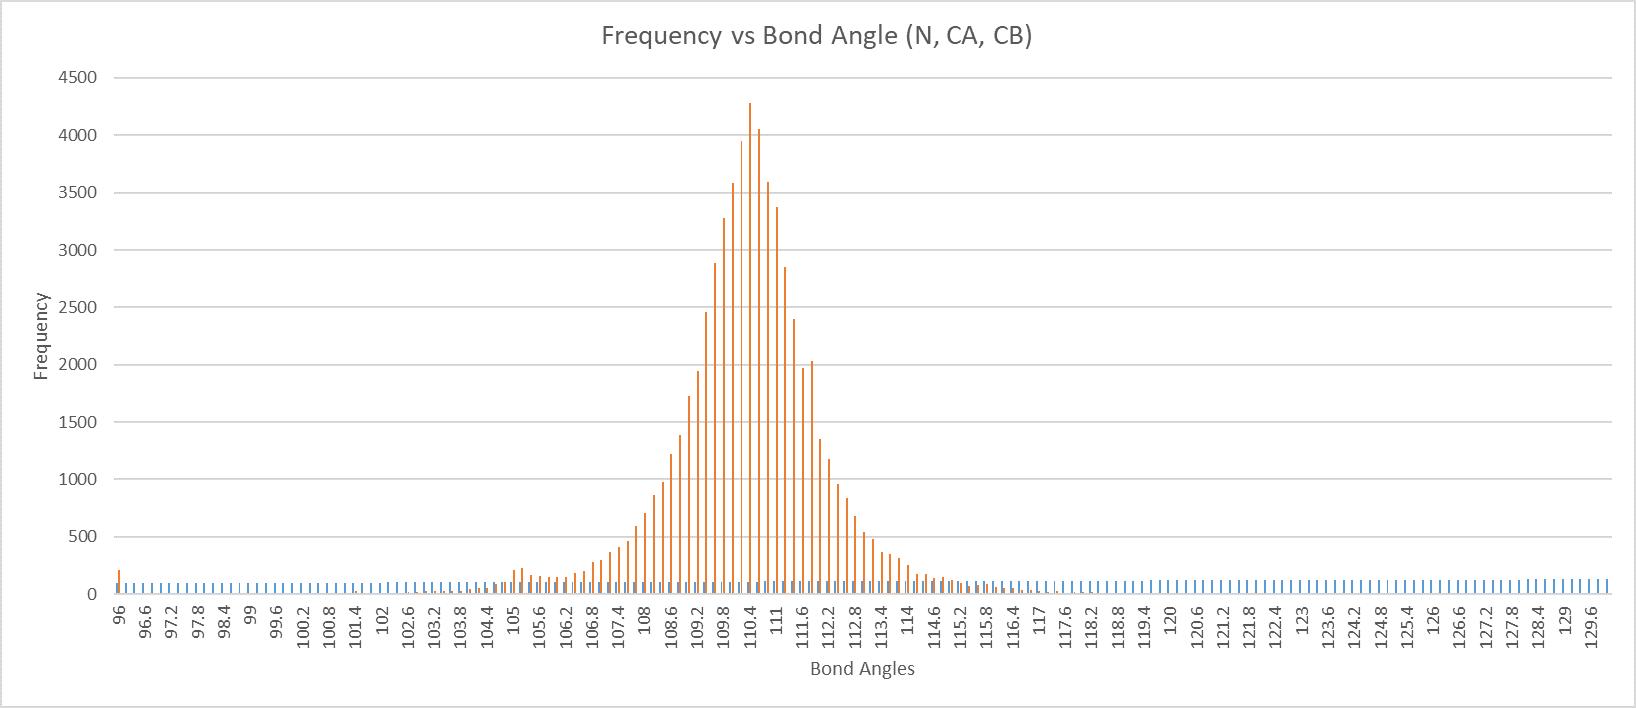 Bond Angle Freq Plot (N, CA, CB)_axes(1)